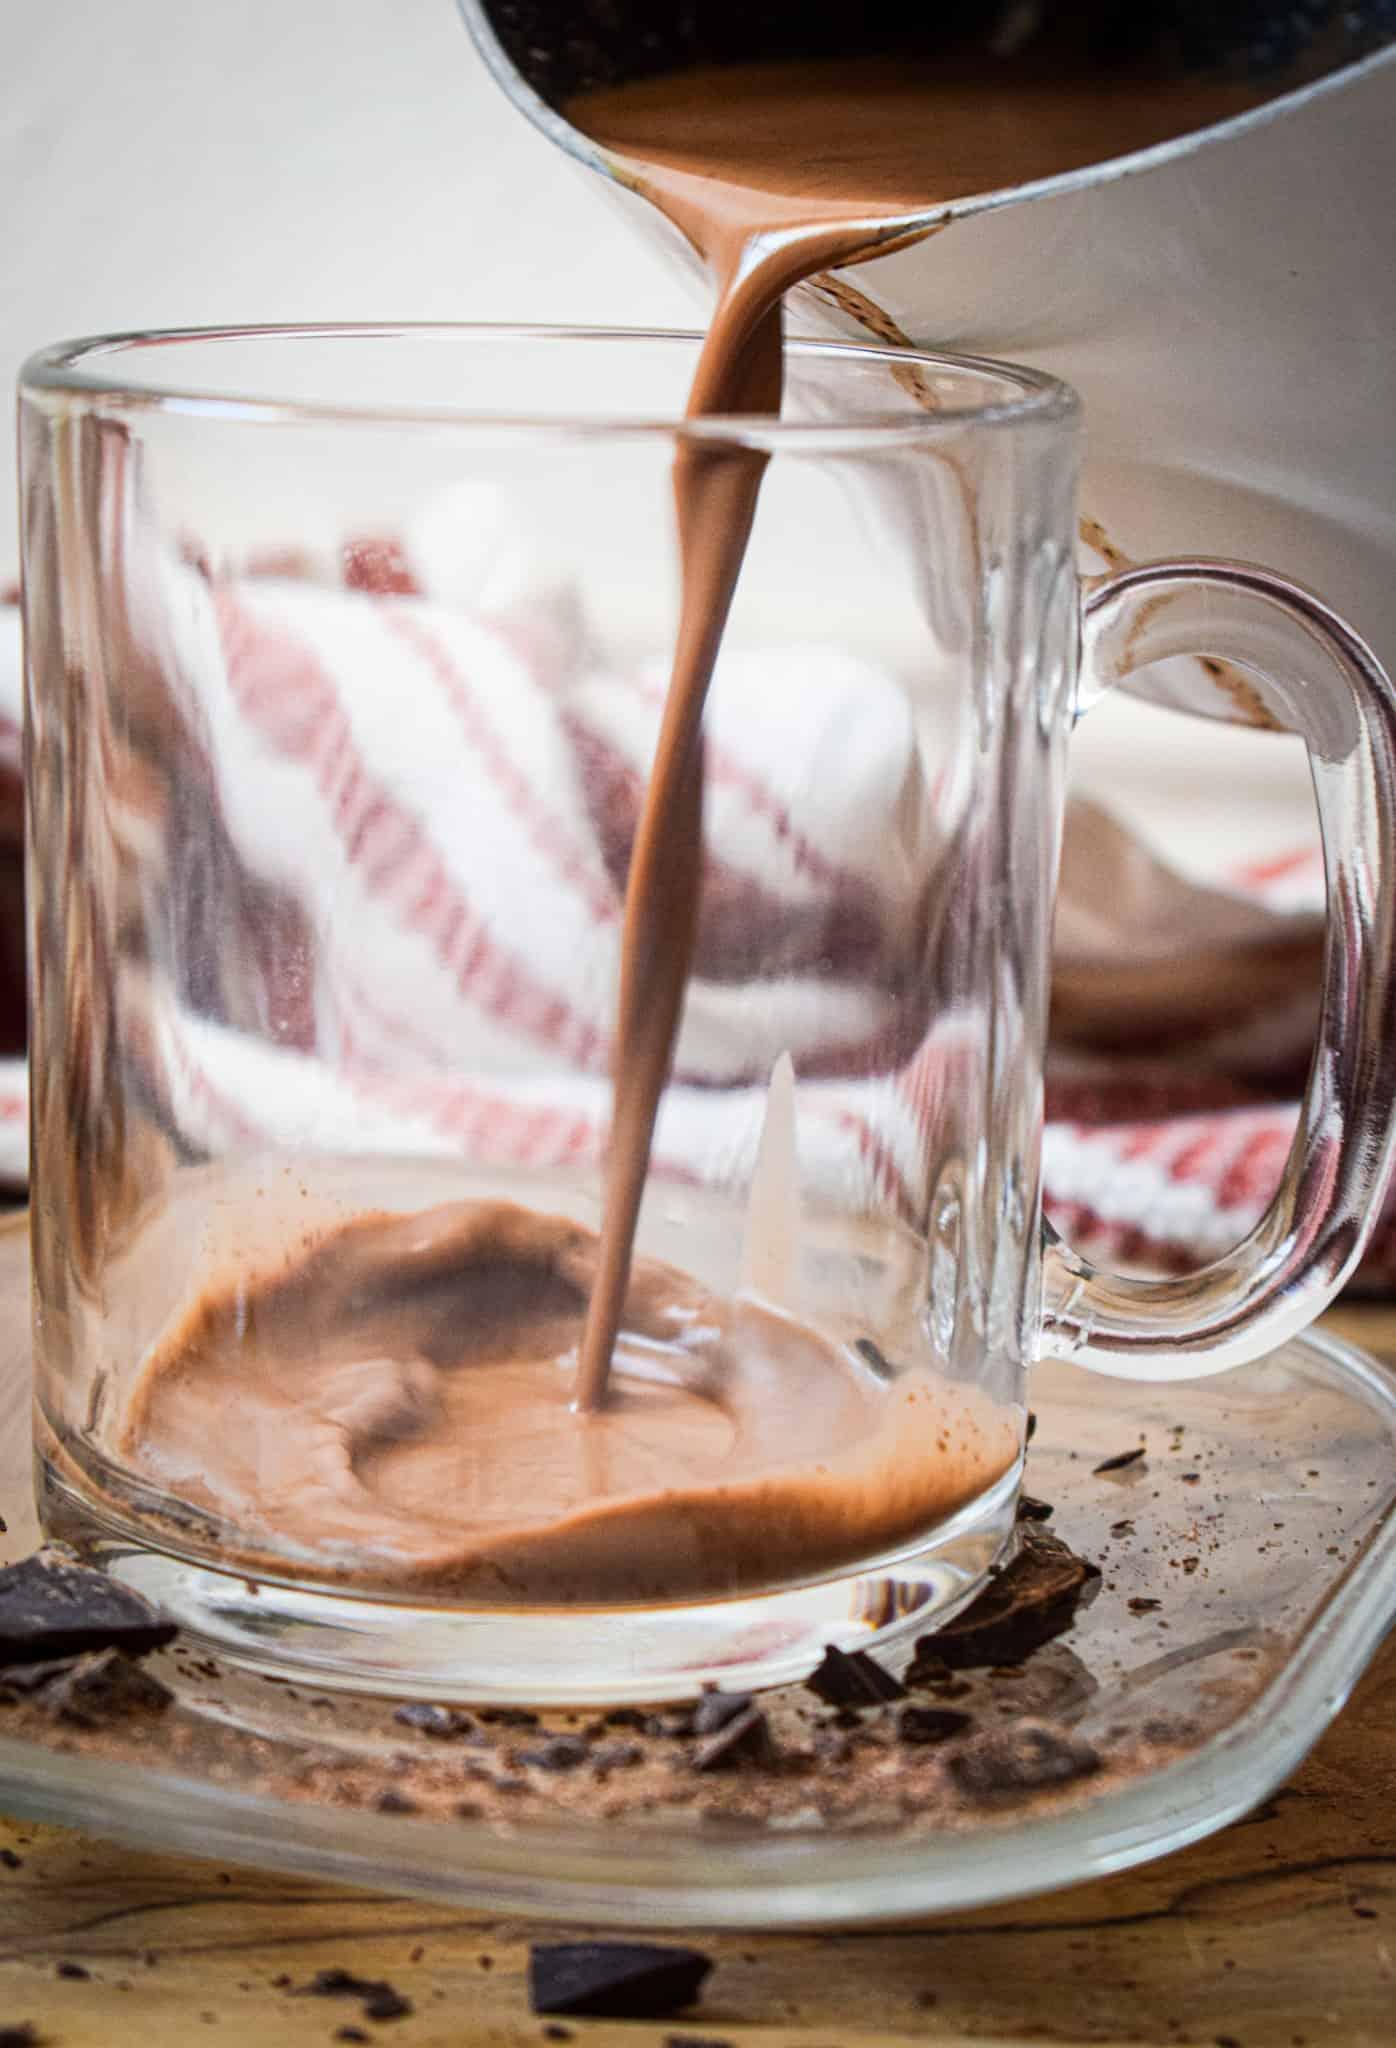 Paleo hot chocolate poured into a glass mug by the jam jar kitchen